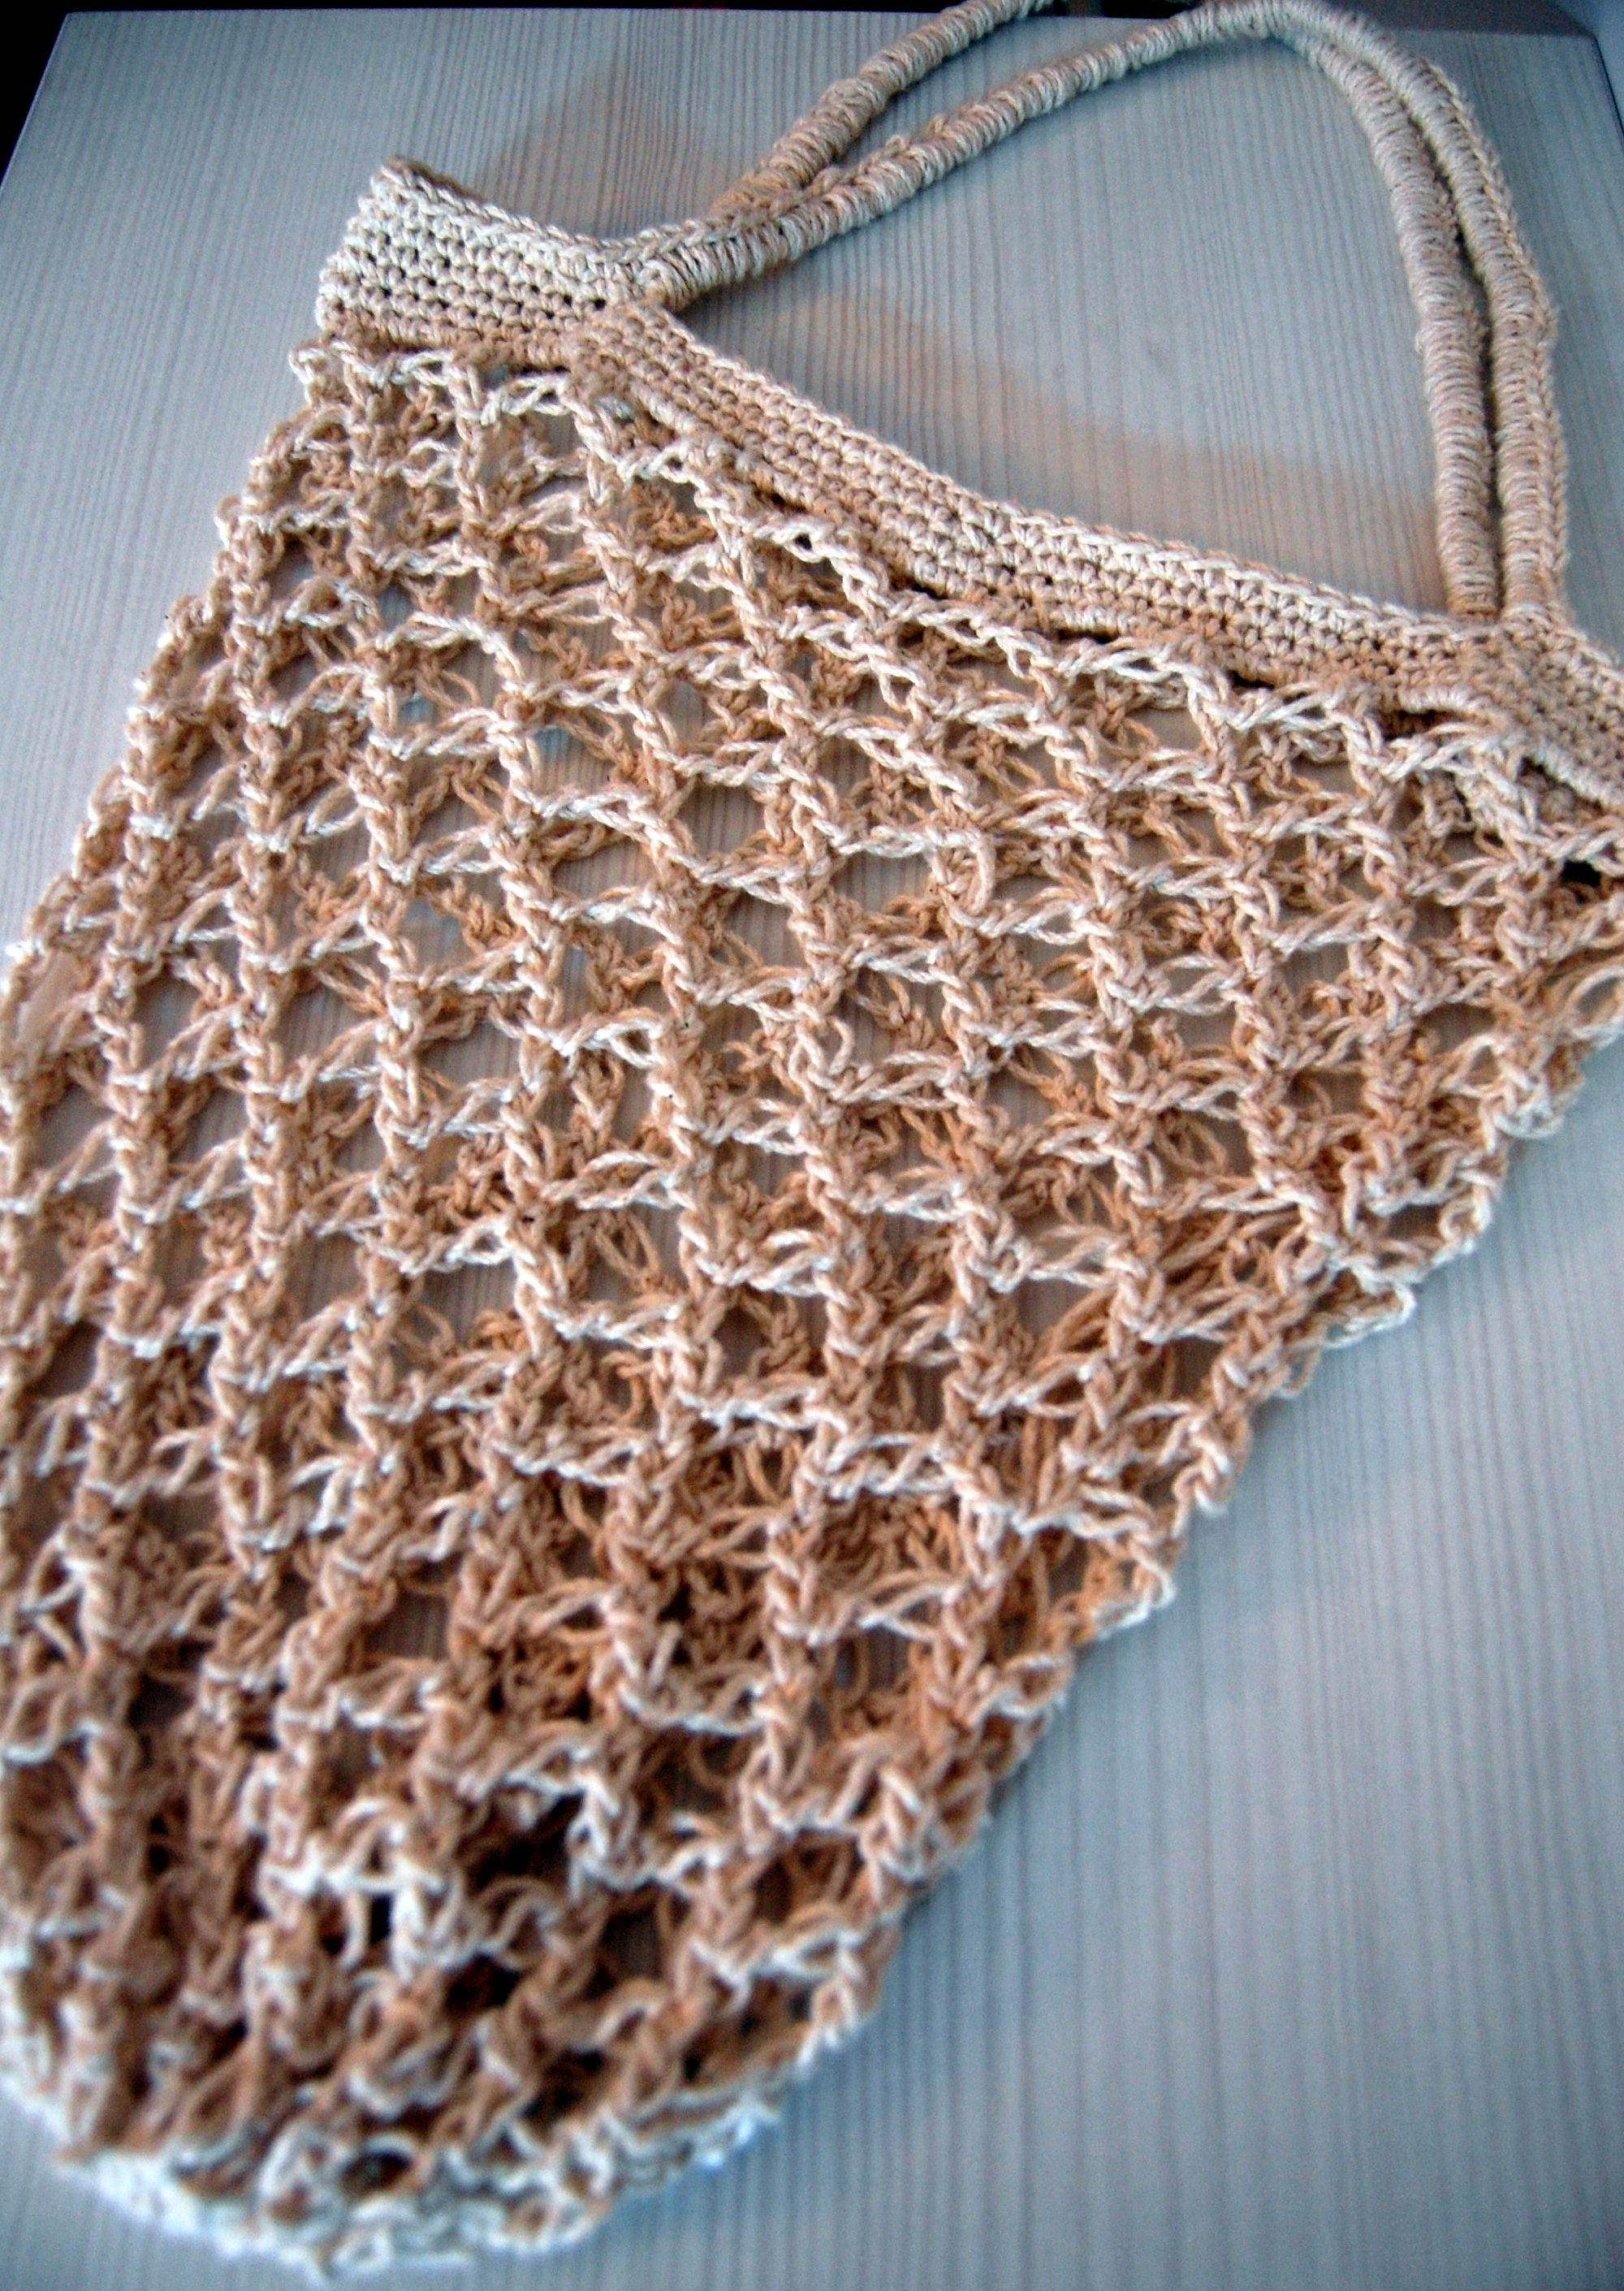 Crochet Shopping Bag : Crochet shopping bag Sewing Crafts Pinterest